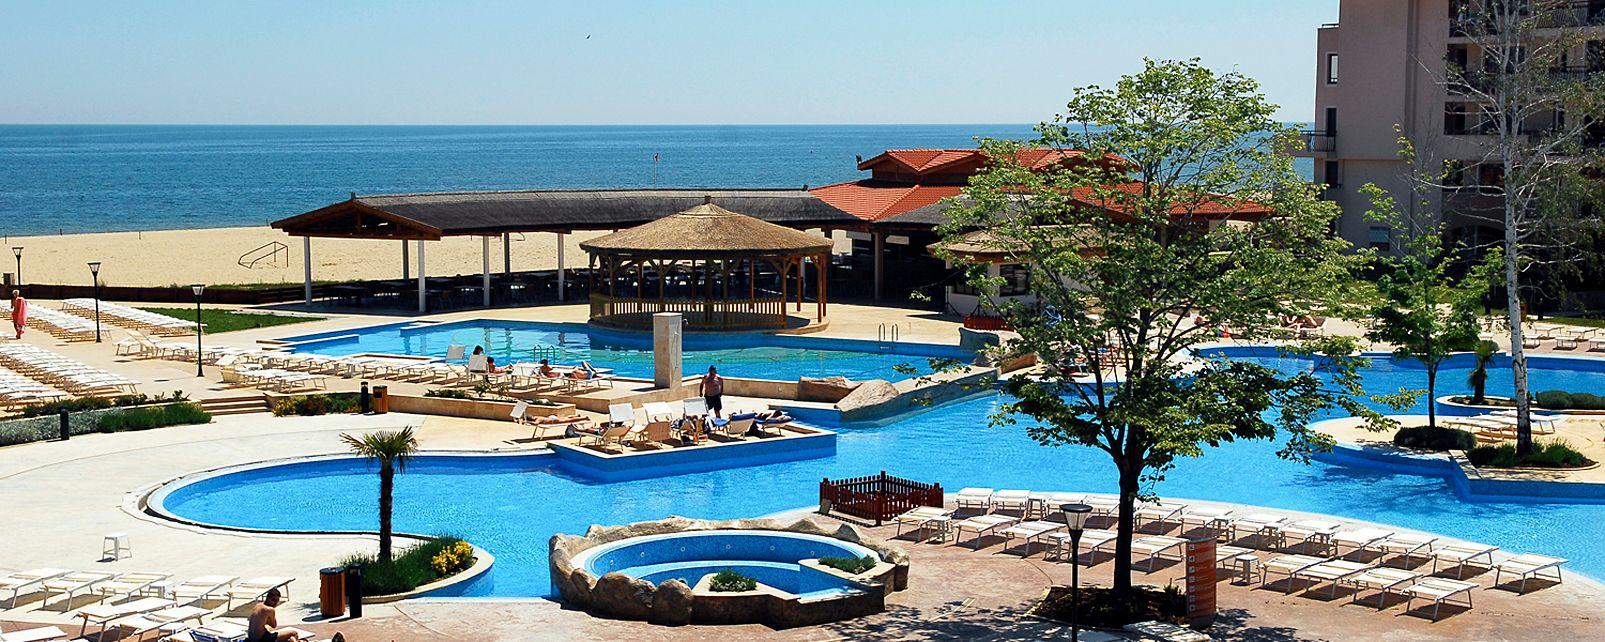 Hôtel HVD Club Hotel Miramar